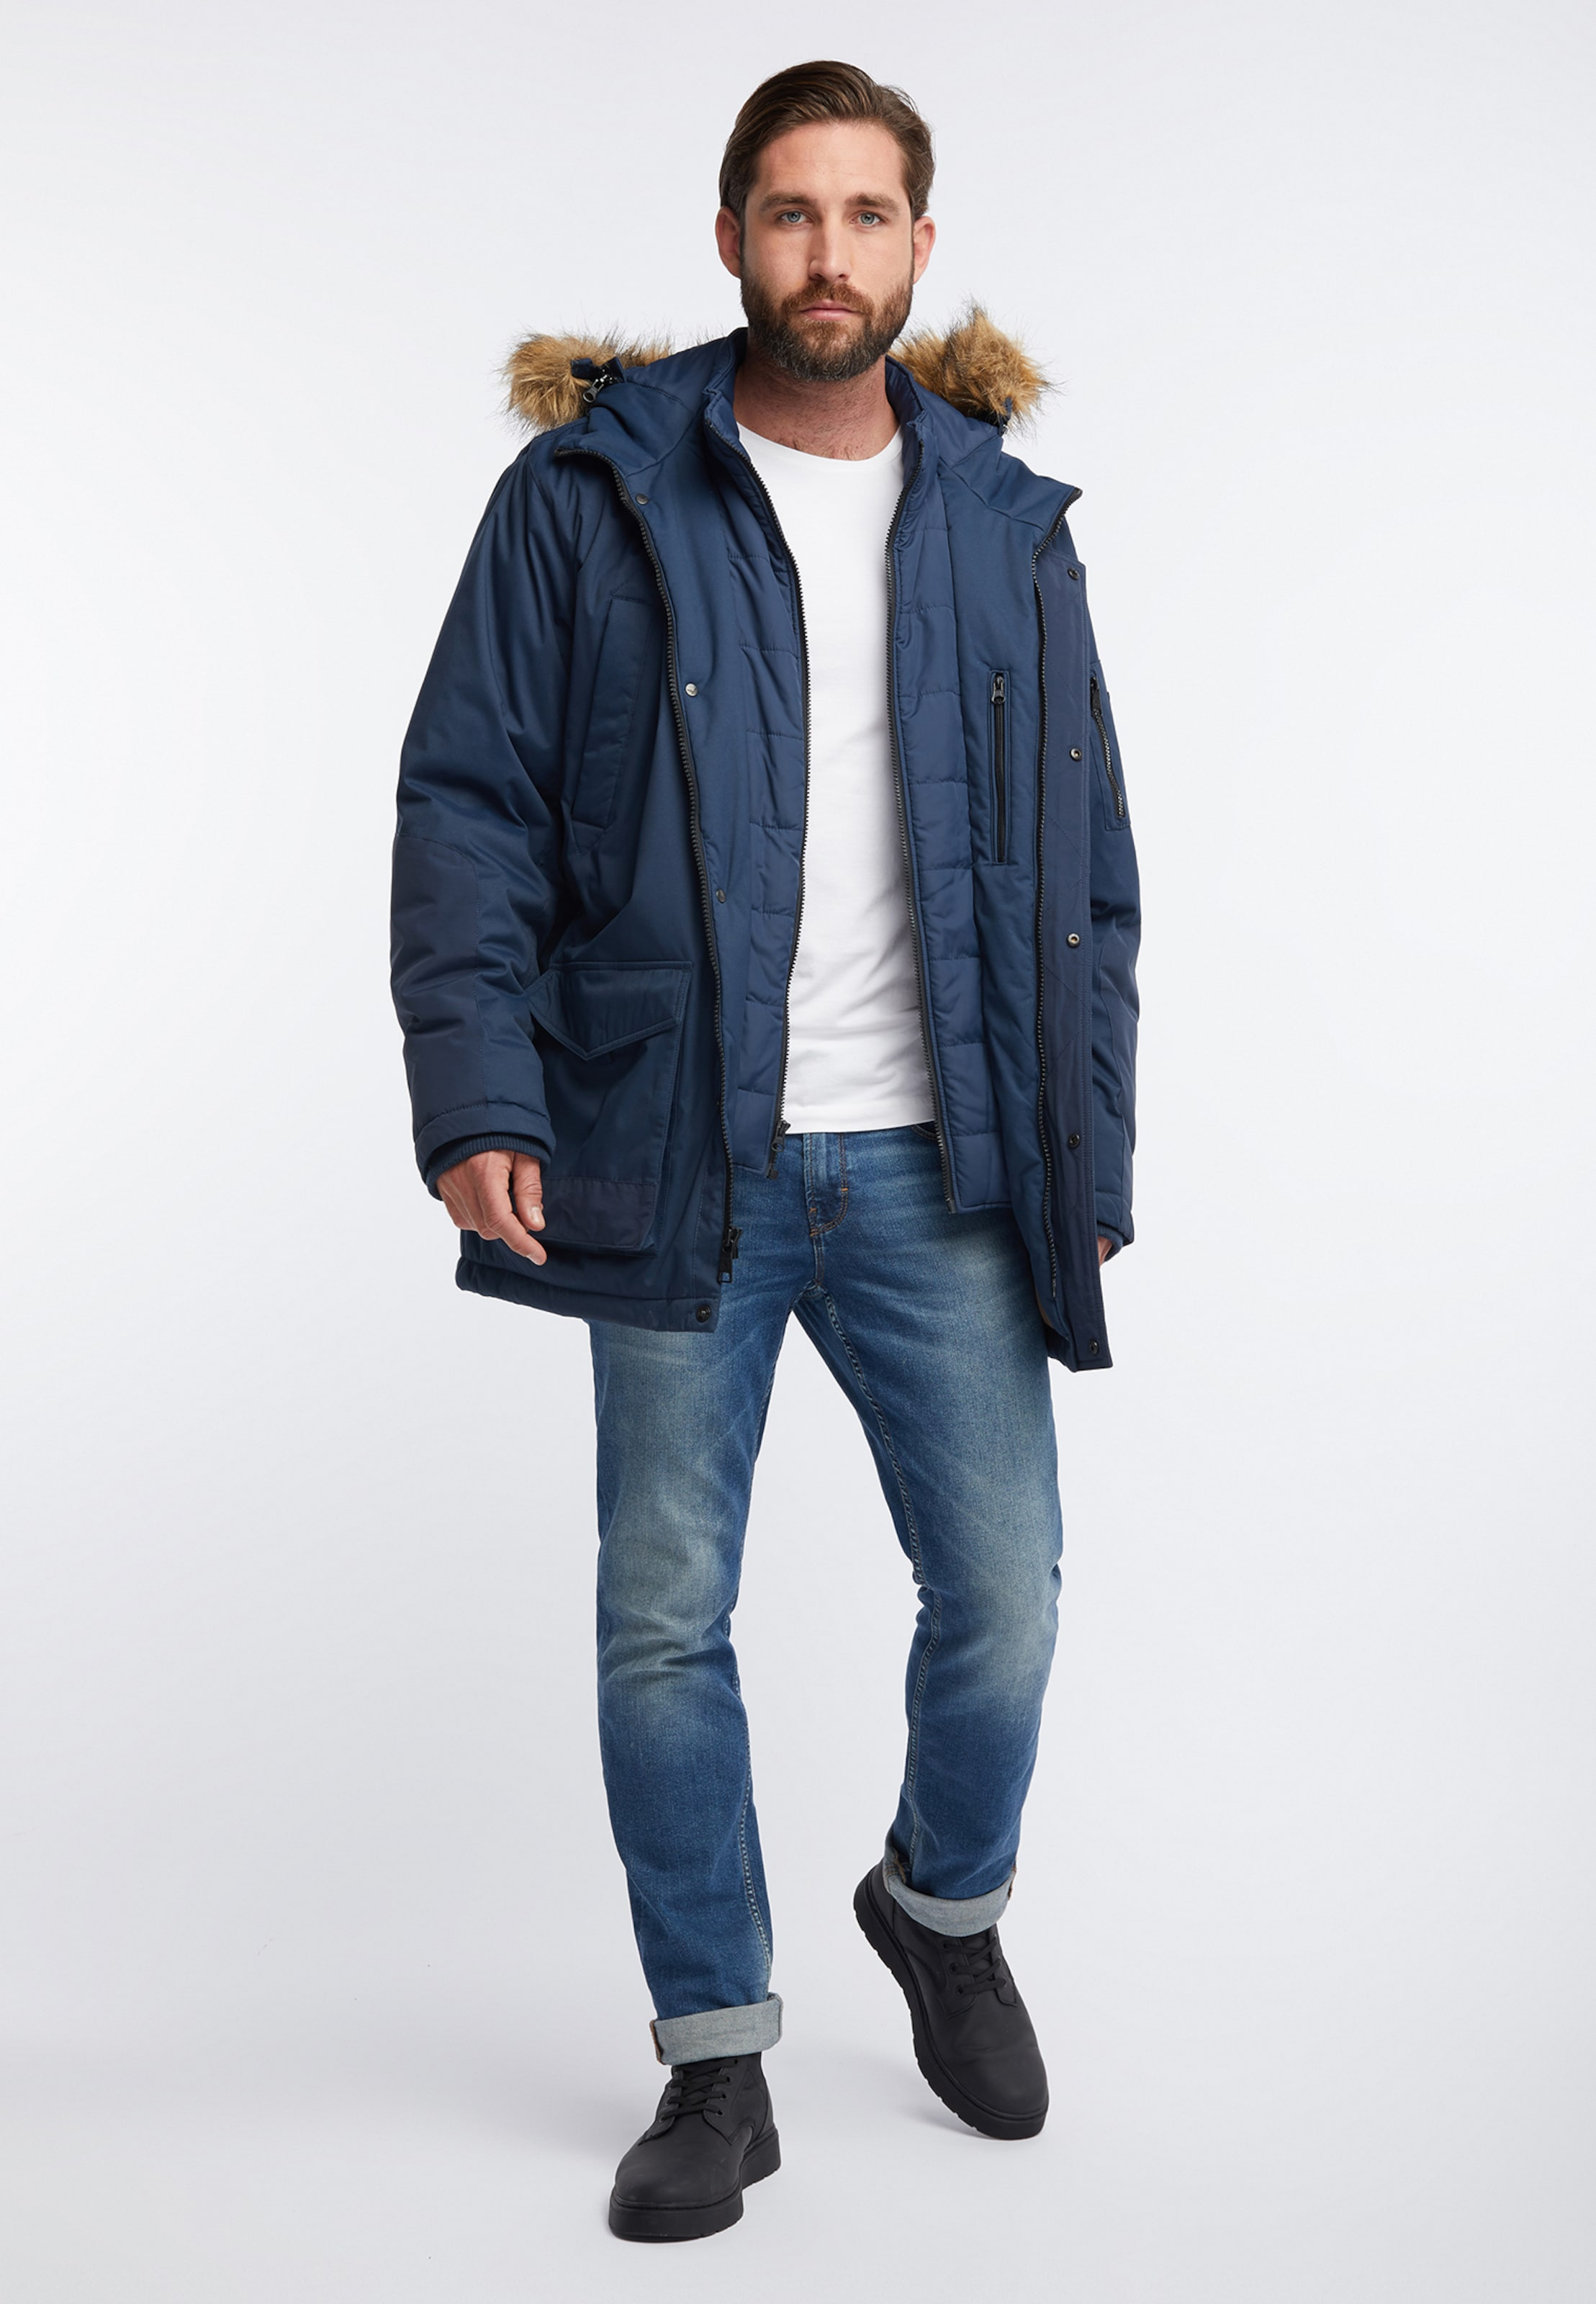 Bleu En Parka Co D'hiver Hawkeamp; PTkiOXZu